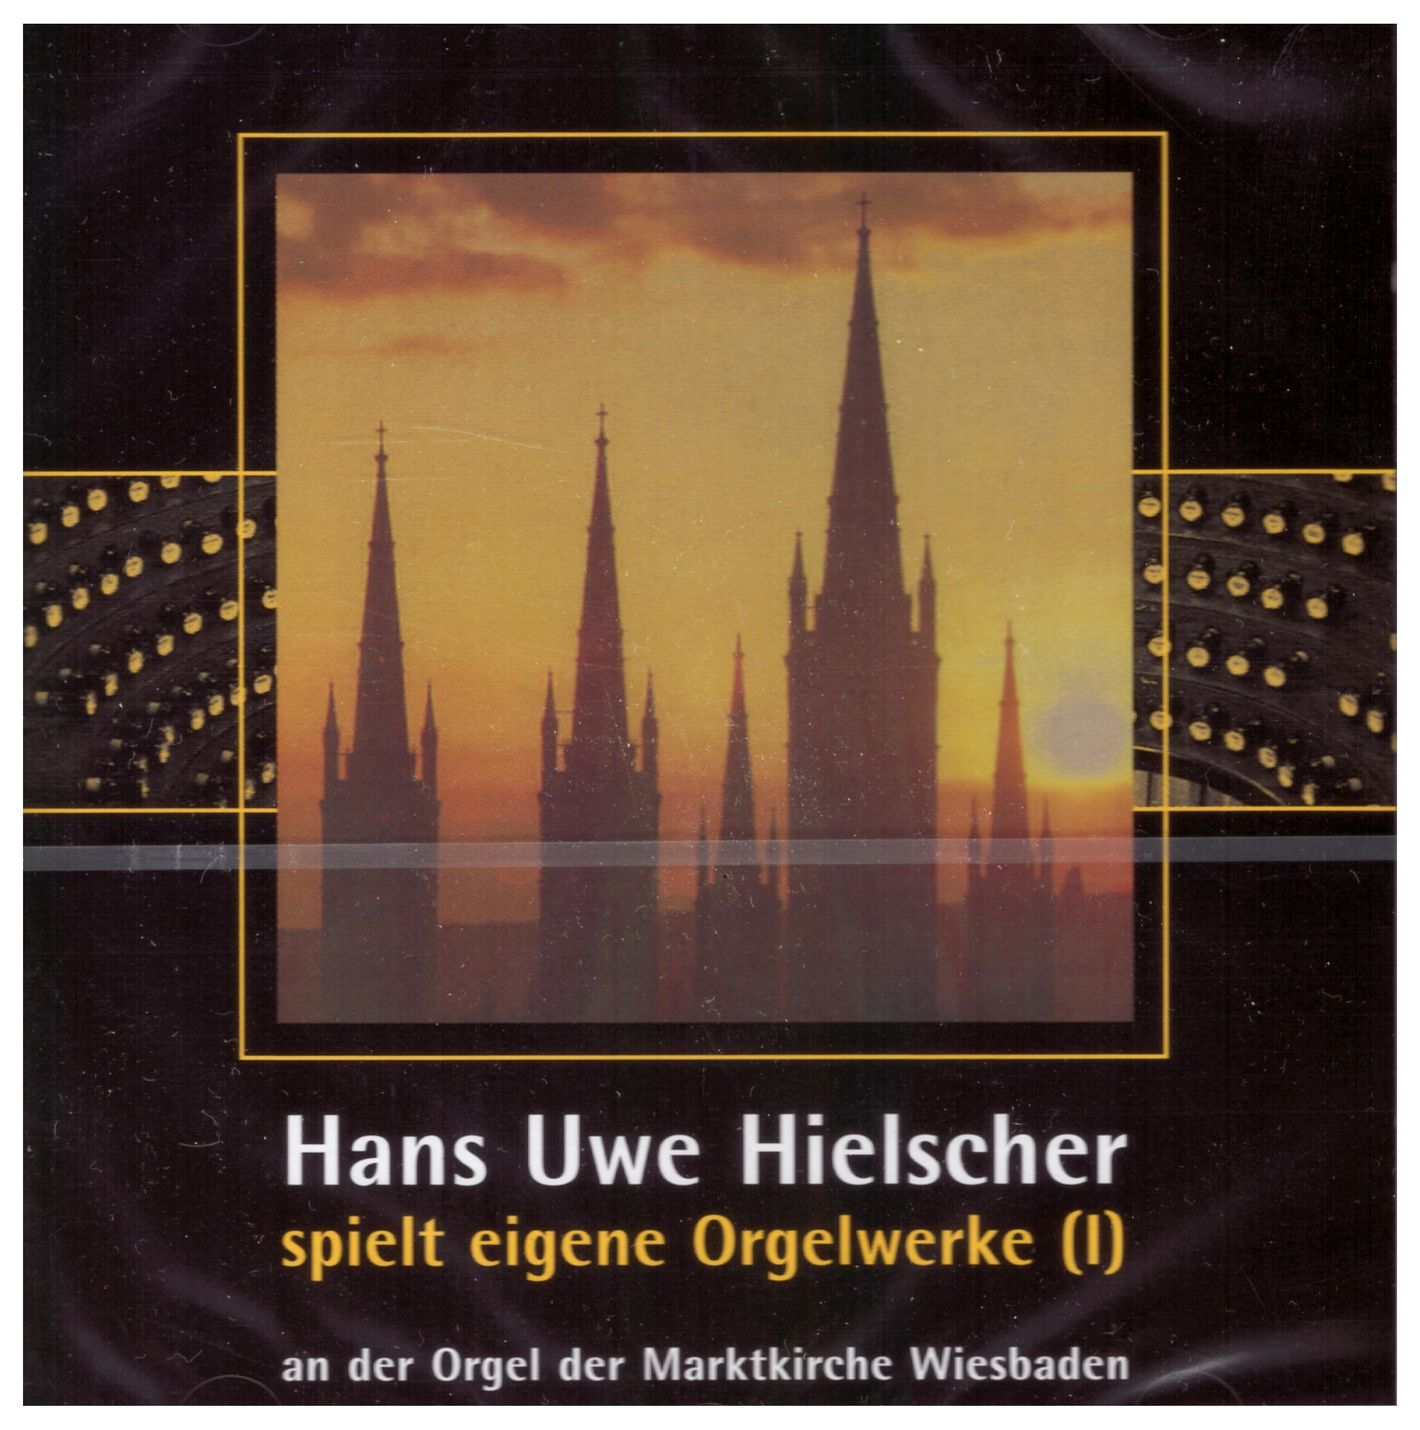 Hans Uwe Hielscher plays own organ works, Vol. I